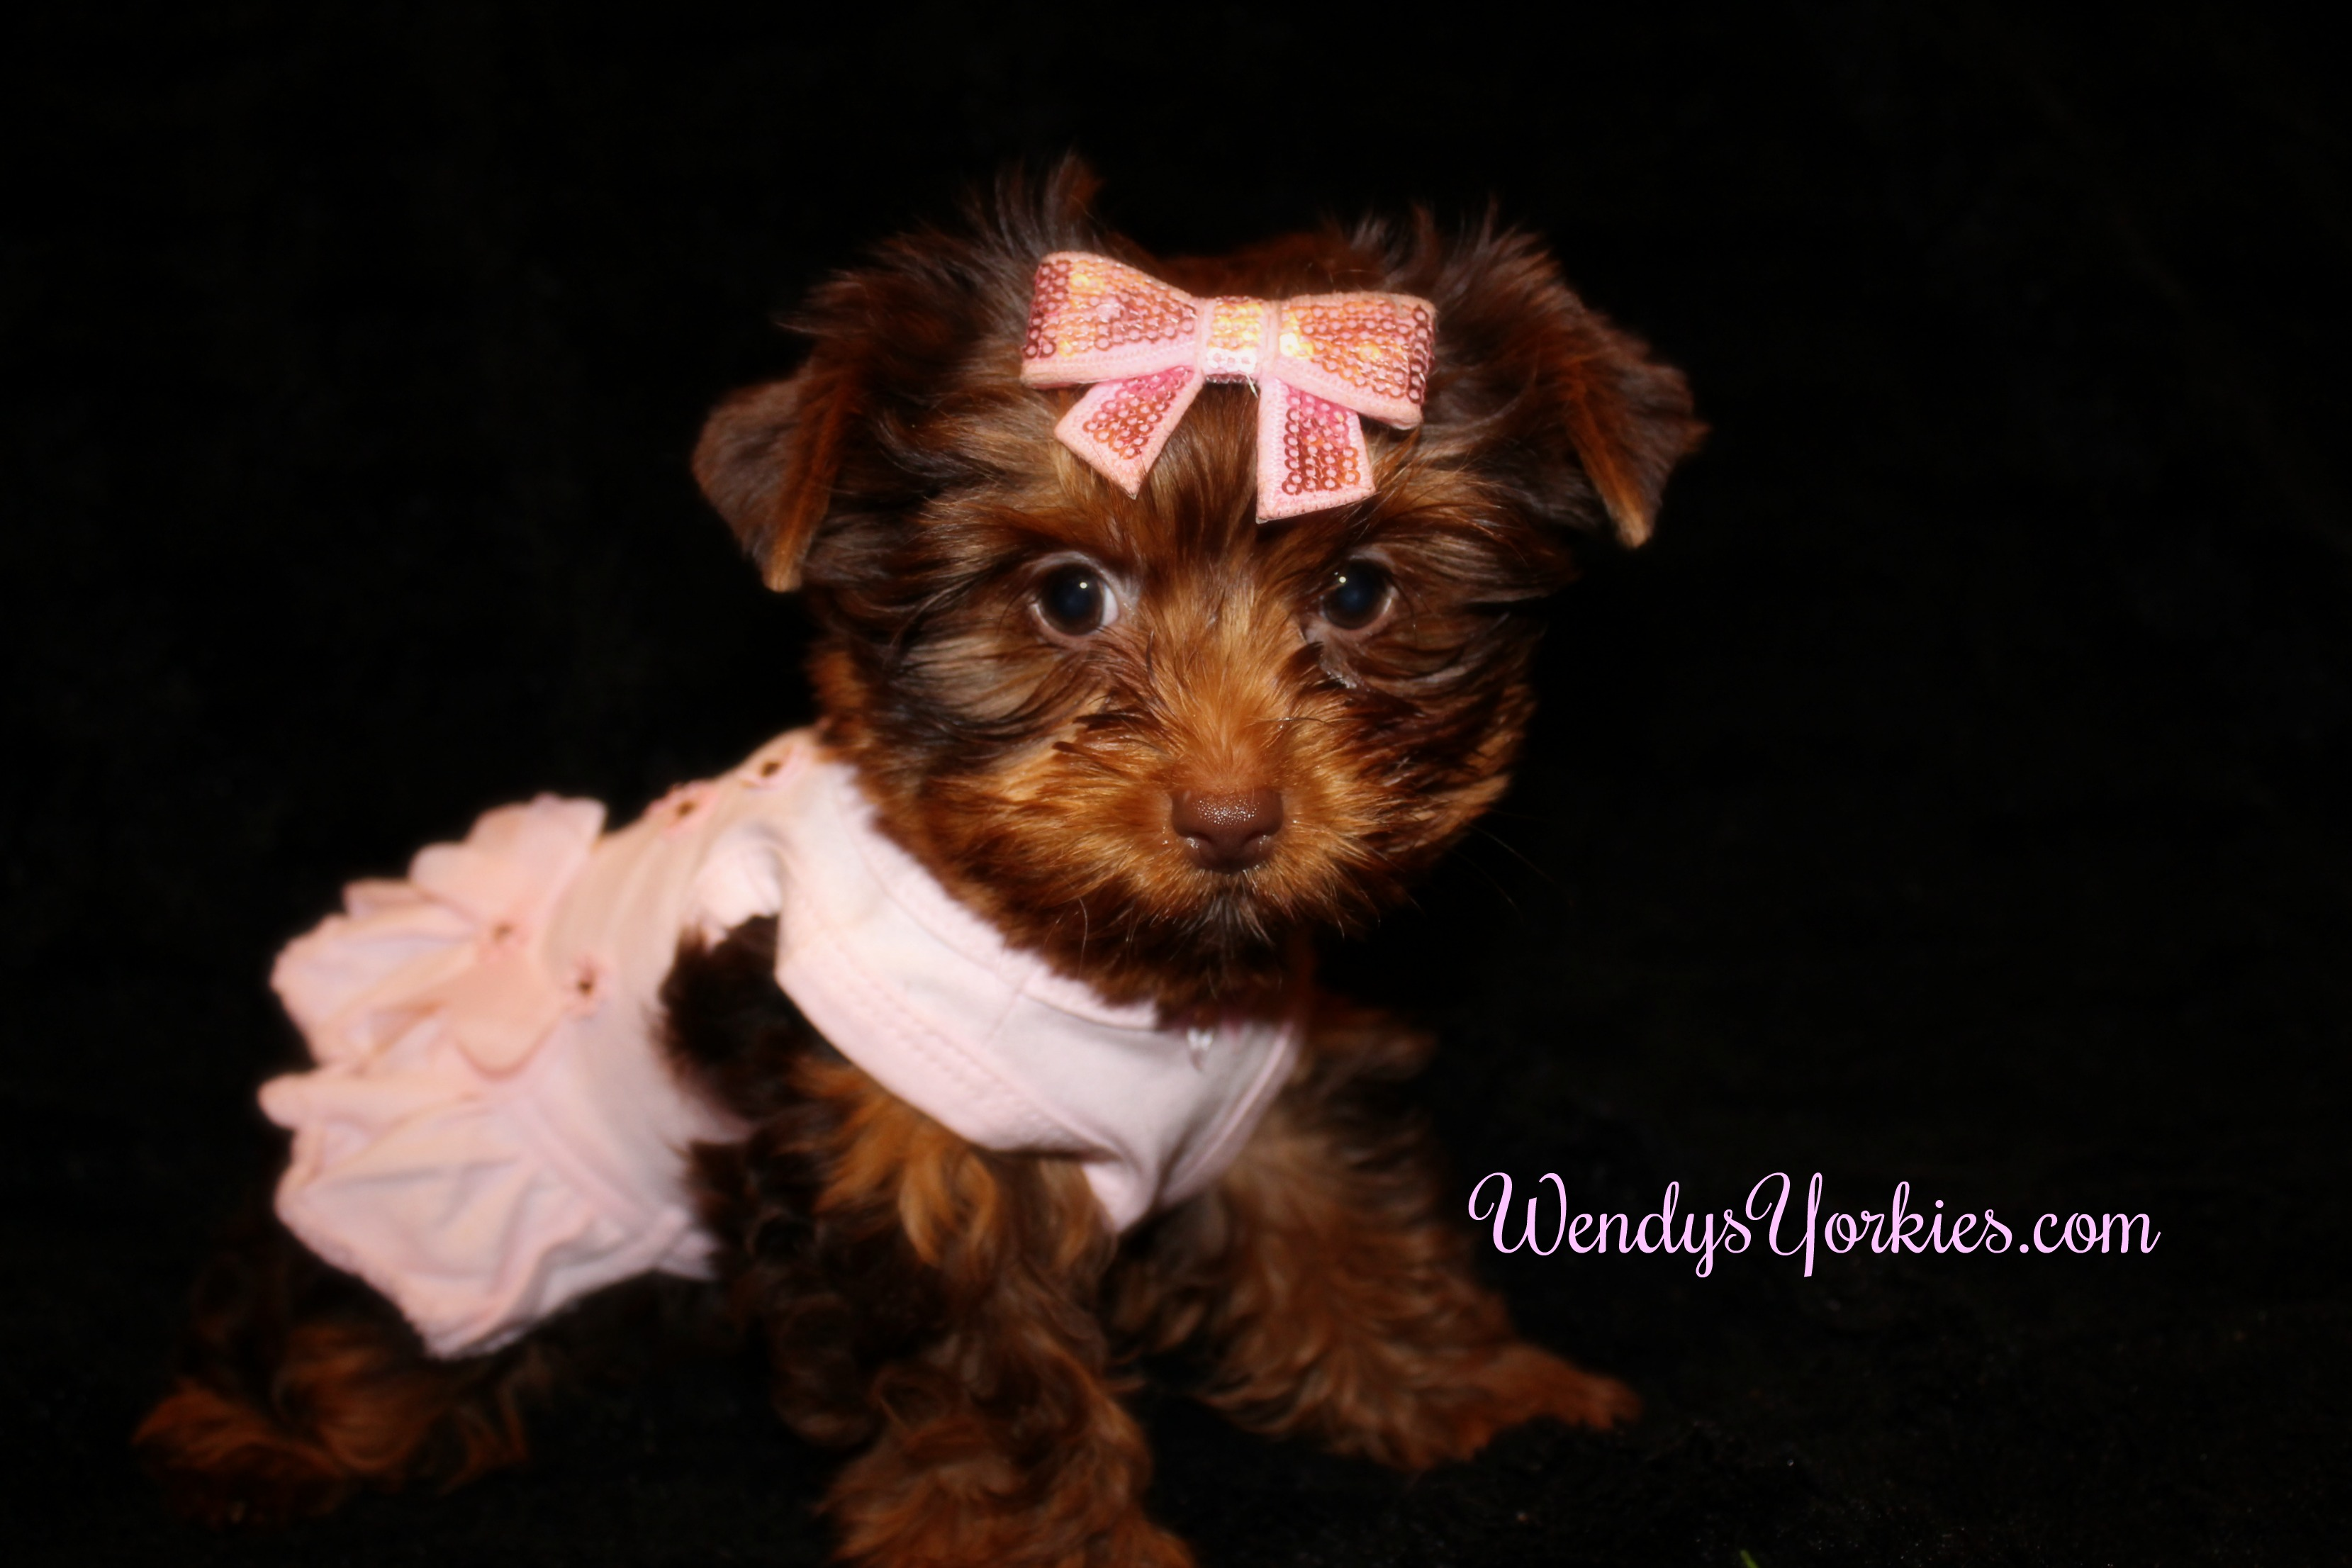 Chocolate Yorkie puppy for sale, WendysYorkies.com, Lela cf1